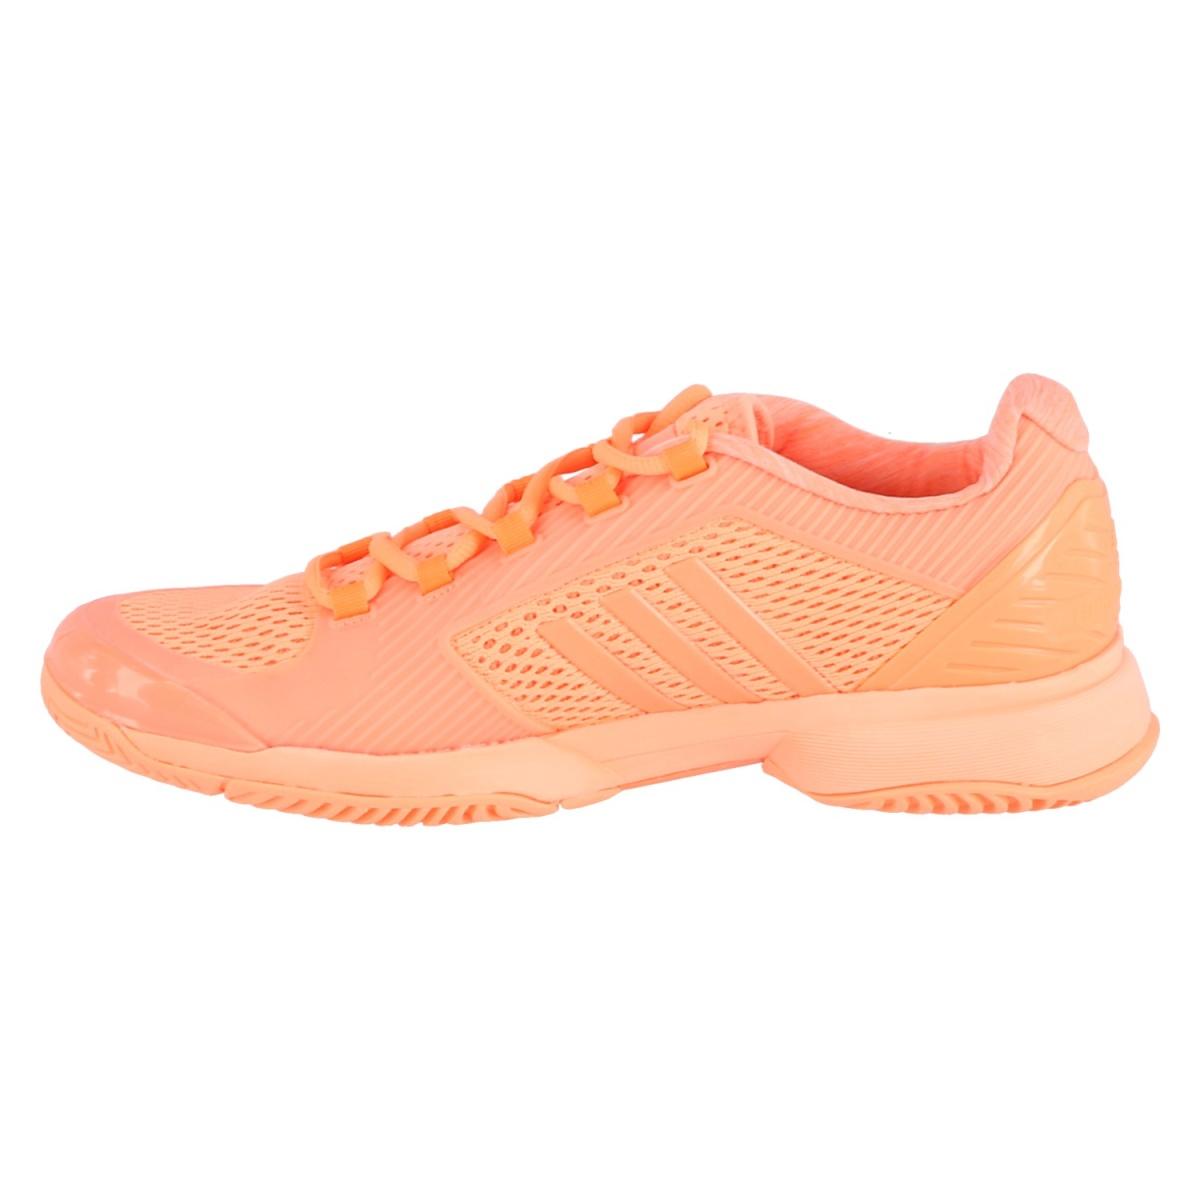 Barricade Asmc Tennisschuhe Stella Adidas Orange Mccartney 2016 c53Ajq4RL